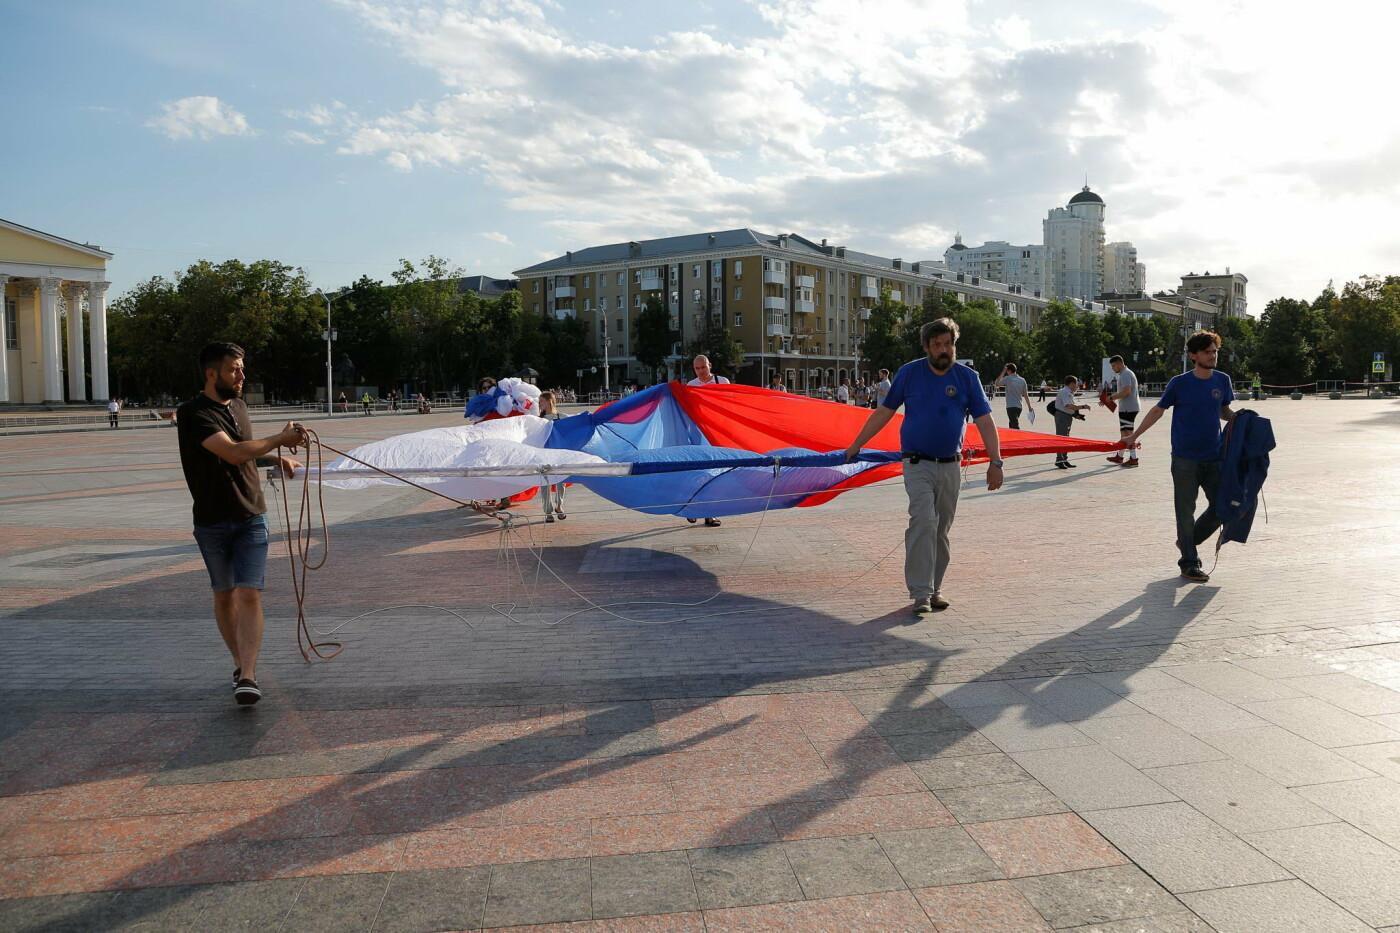 Над Белгородом пролетел аэростат с гигантским триколором, фото-7, Фото: Антон Вергун